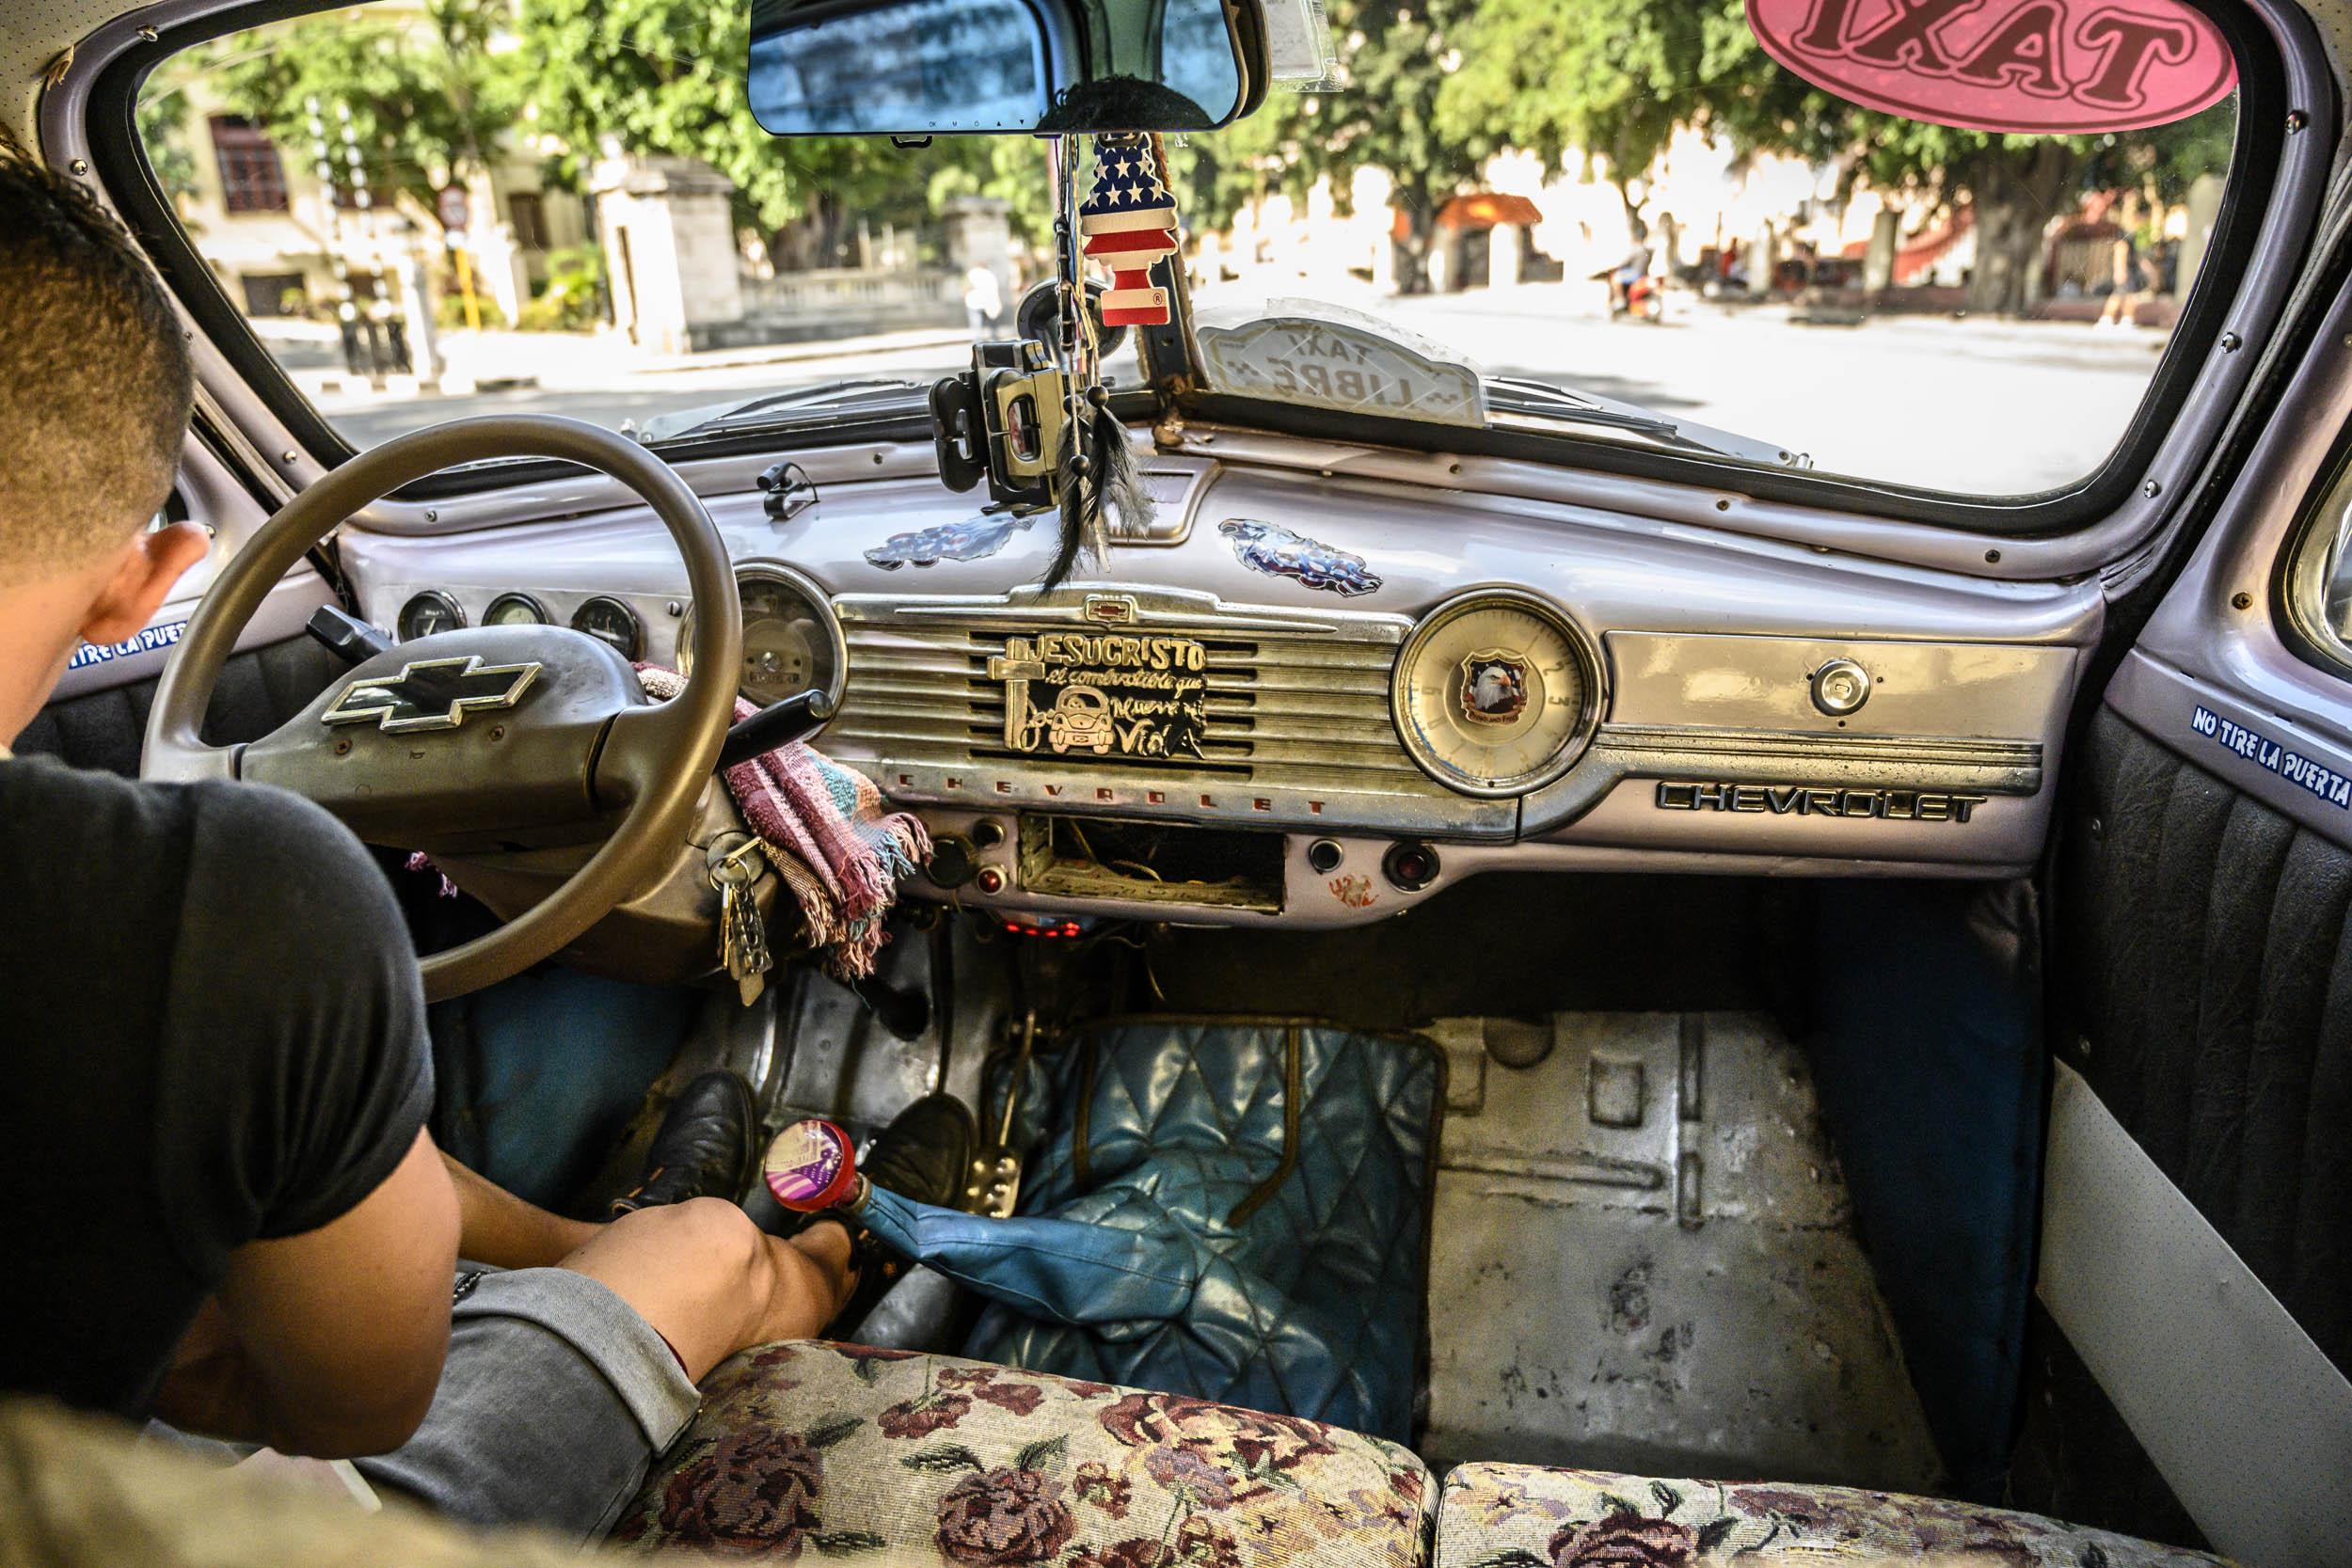 Simbolos - Cuba - Hector Garrido, Aerial and human photography